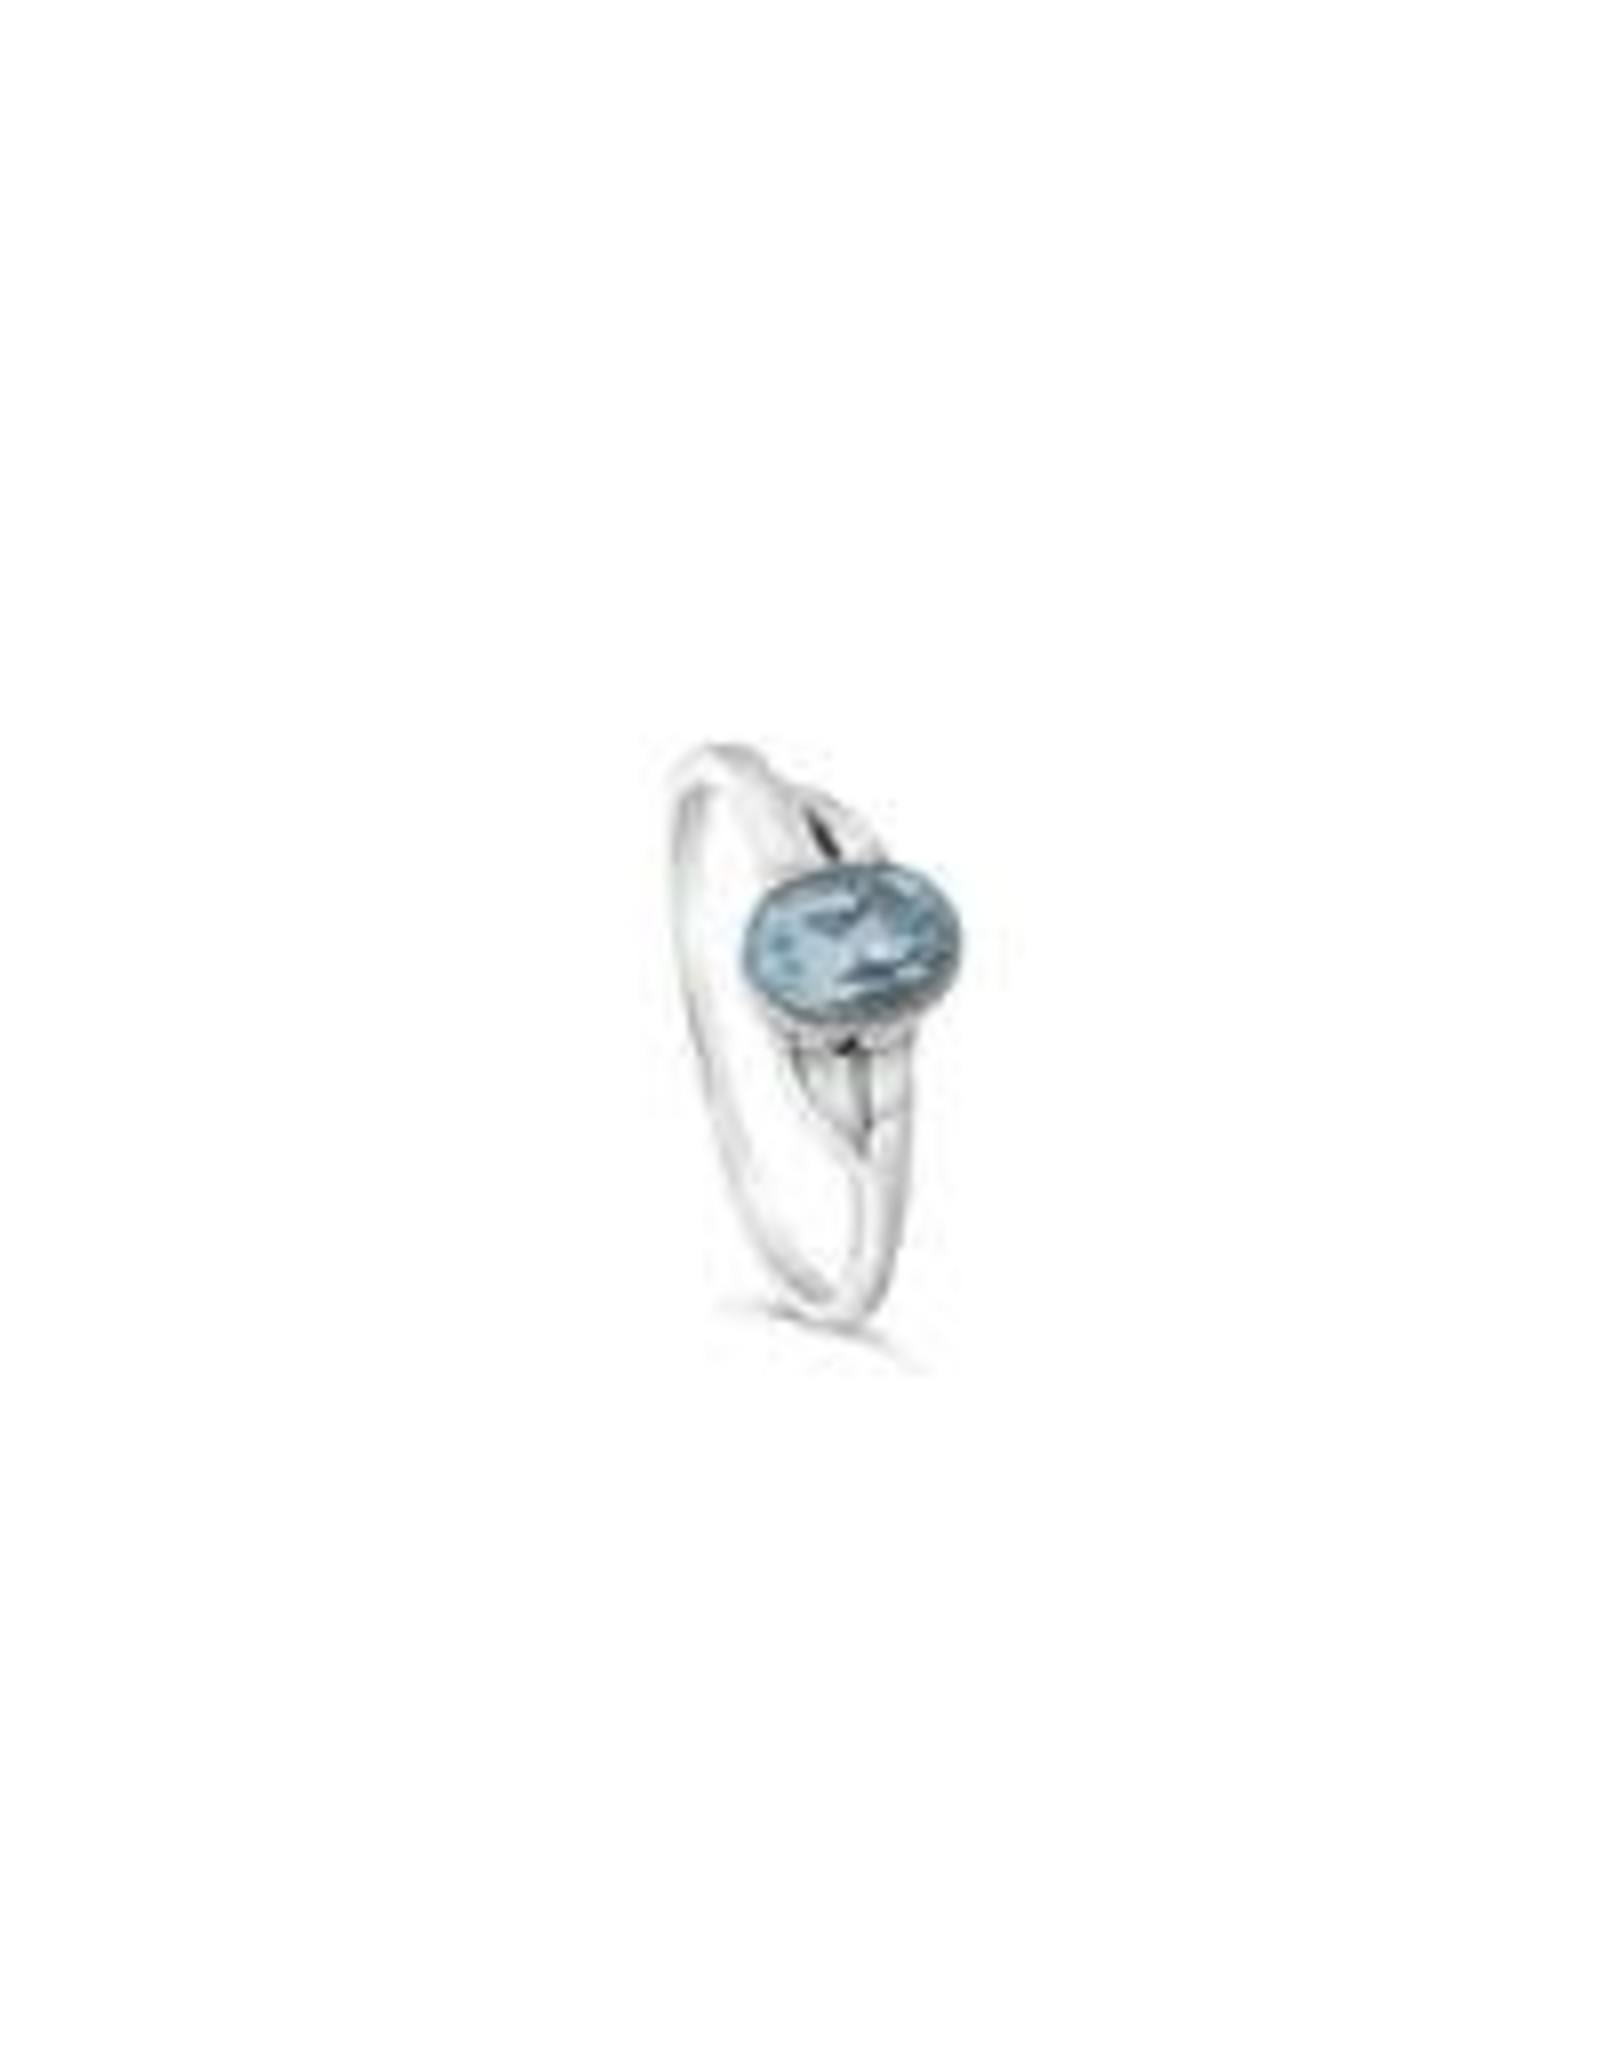 Stones & Silver Blue Topaz Ring 7 x 5mm